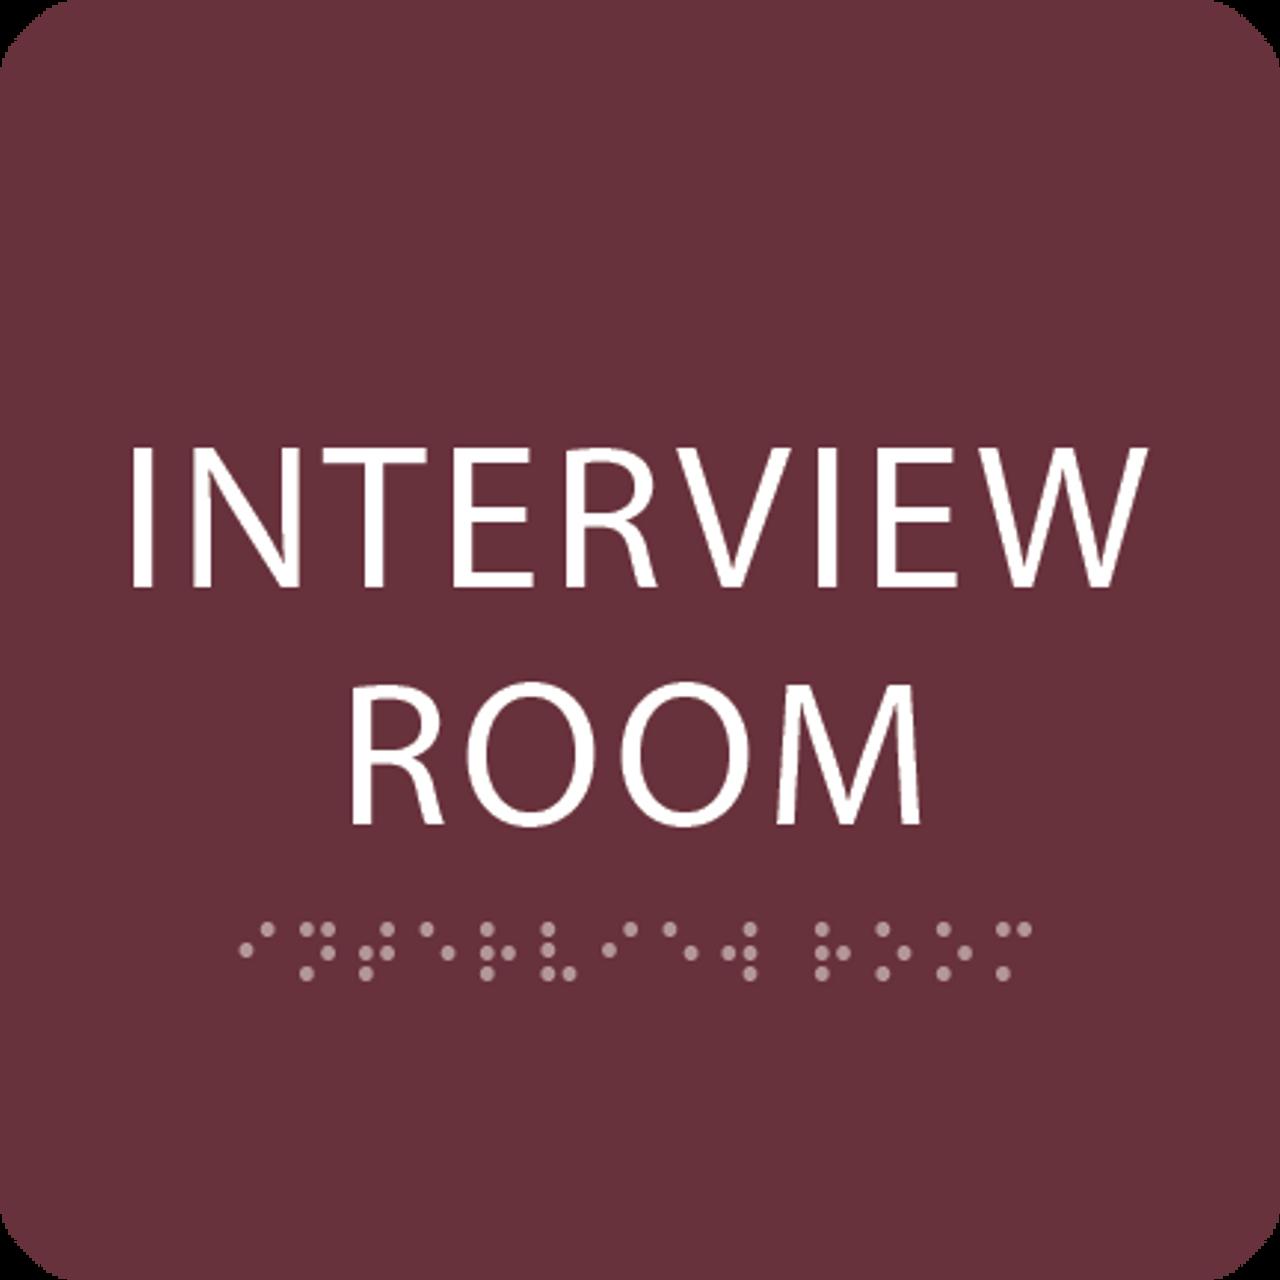 Burgundy Interview Room ADA Sign